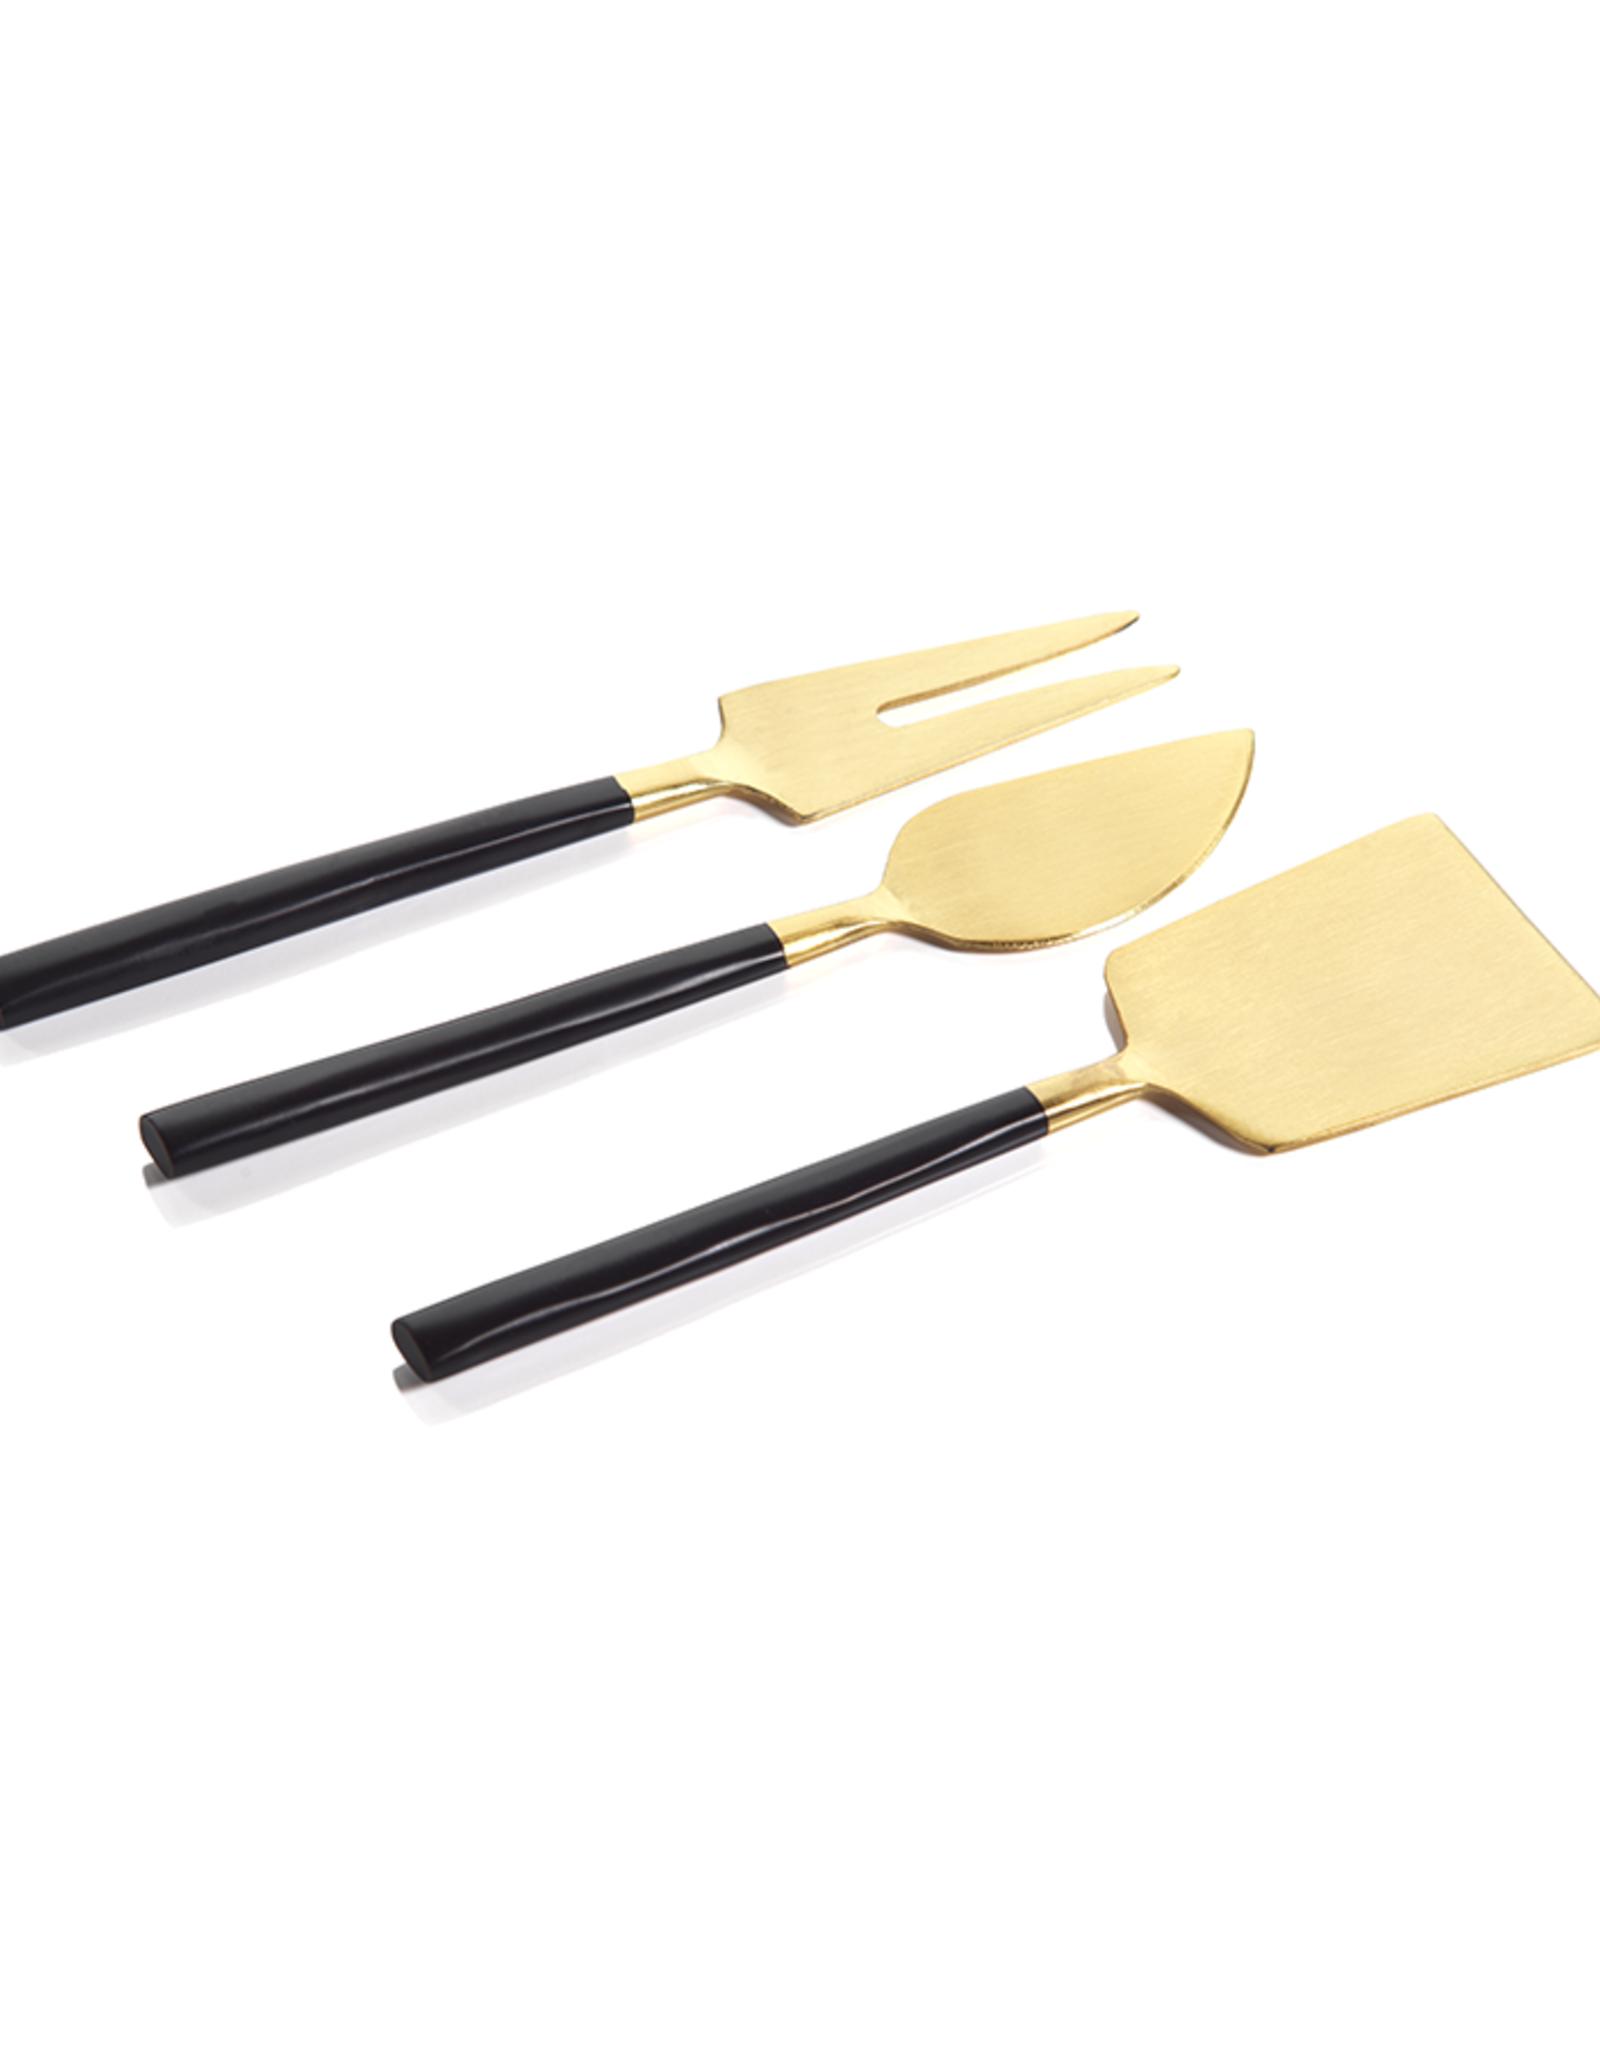 Maxfield Black & Gold Cheese Set